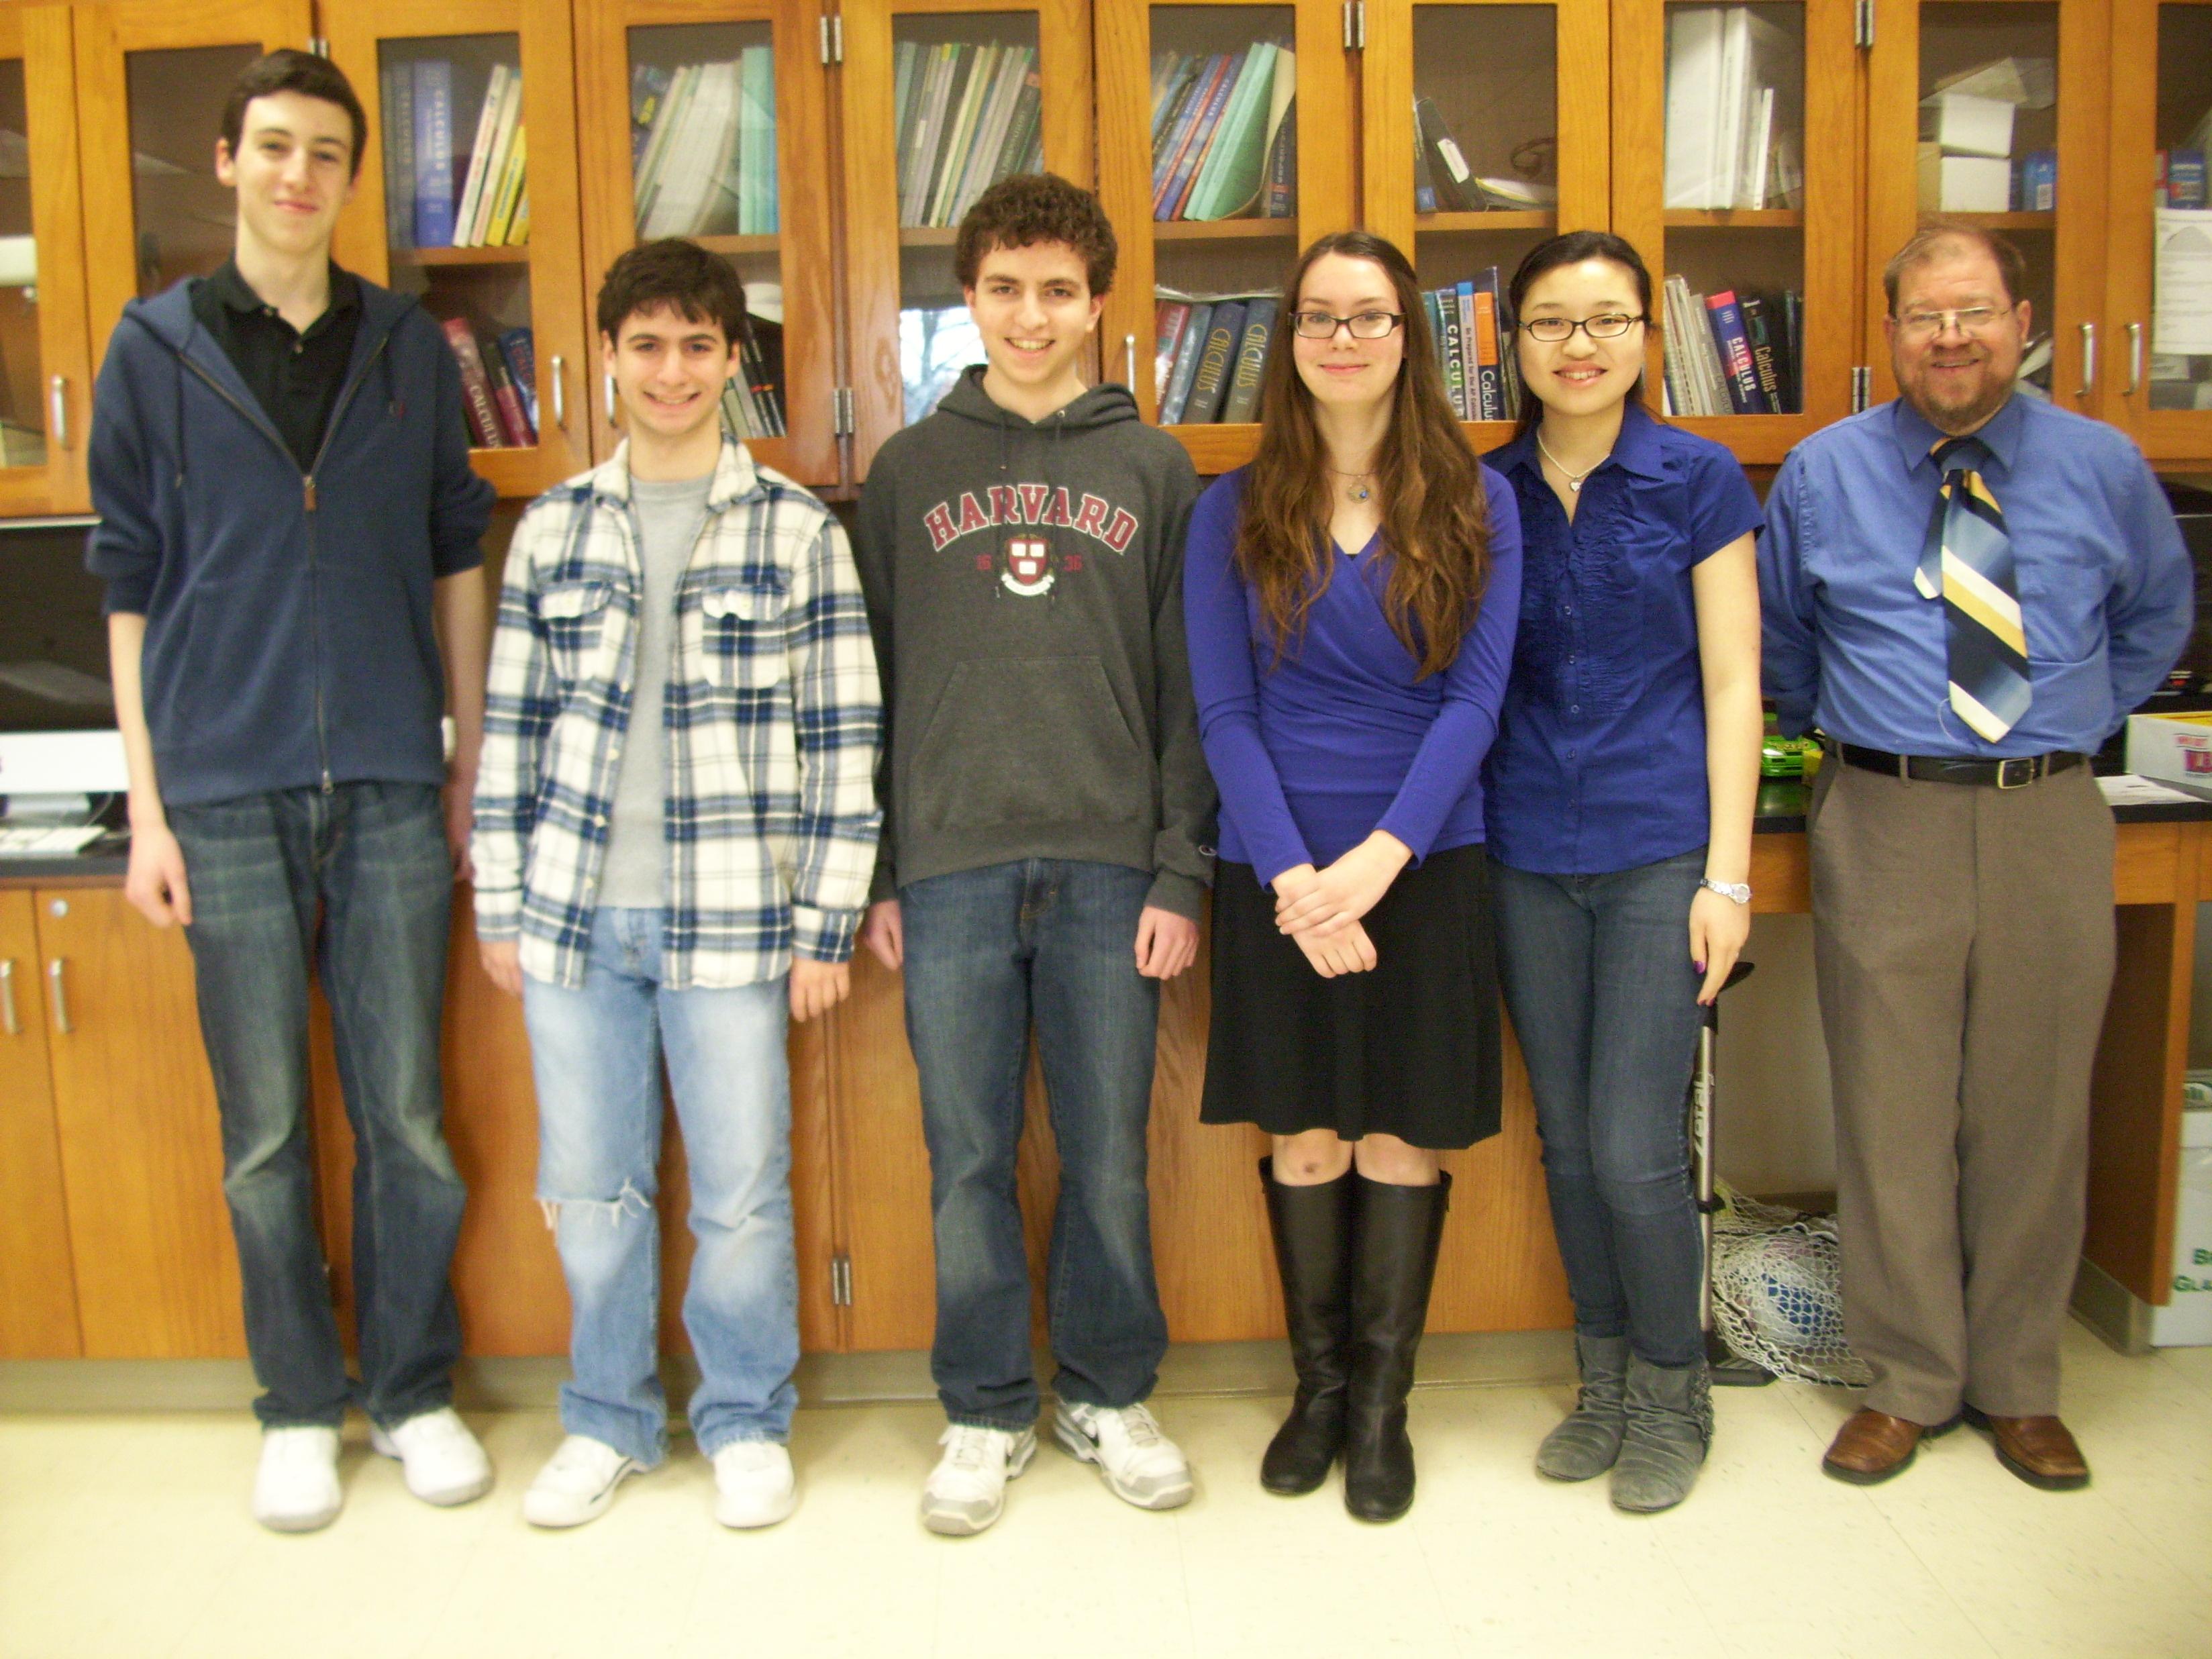 Members of the Joel Barlow Challenge team, from left to right are Nicolo Marzaro, Cooper D'Agostino, Benjamin Lewson, Julia Wargo, Lia Cirelli, and Mr. Ecsedy.